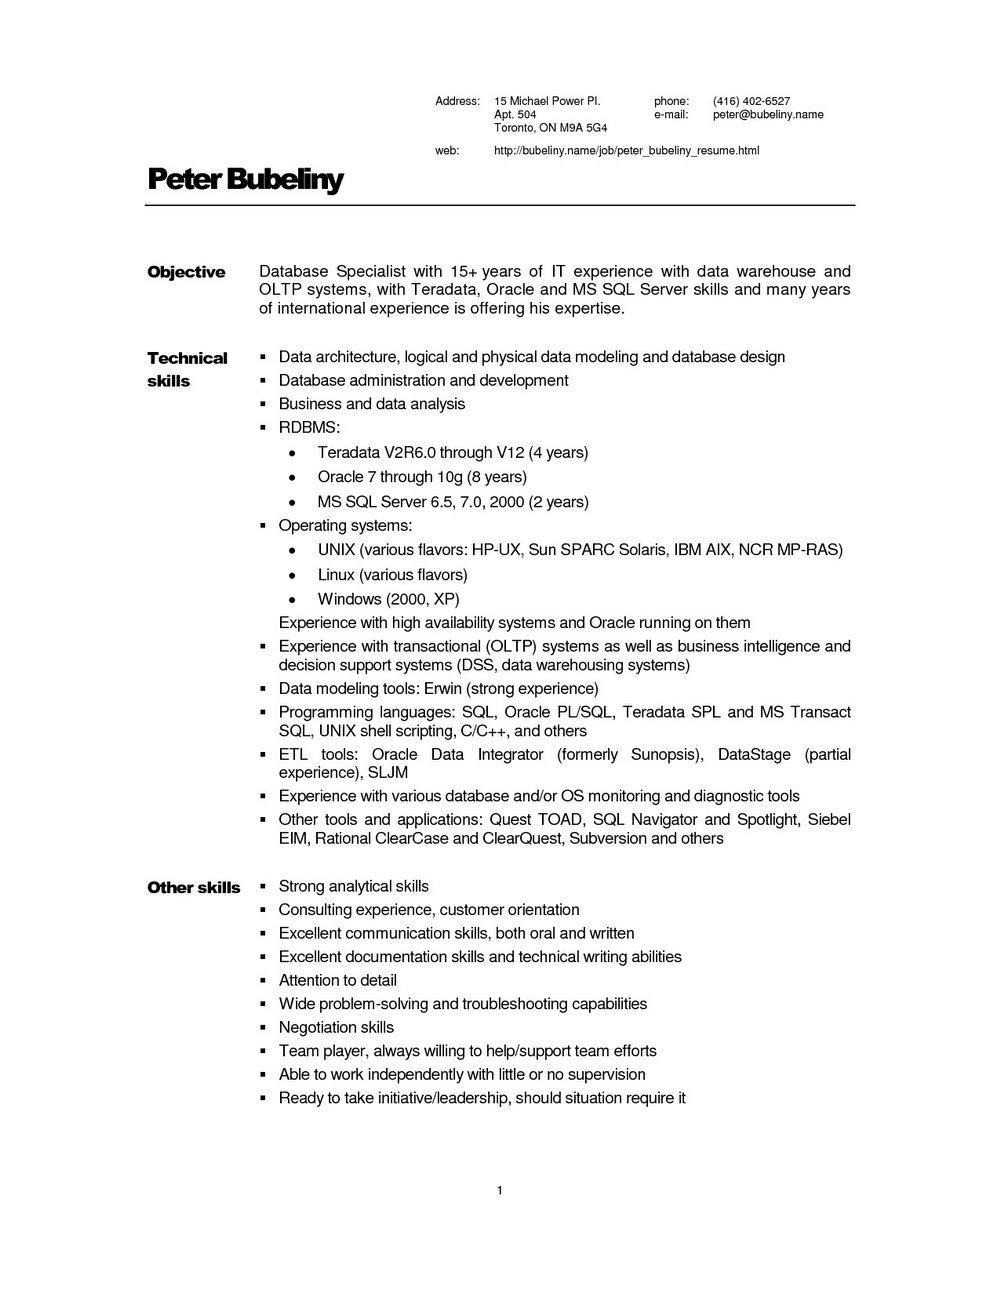 Sample Data Warehouse Resume | Universal Network